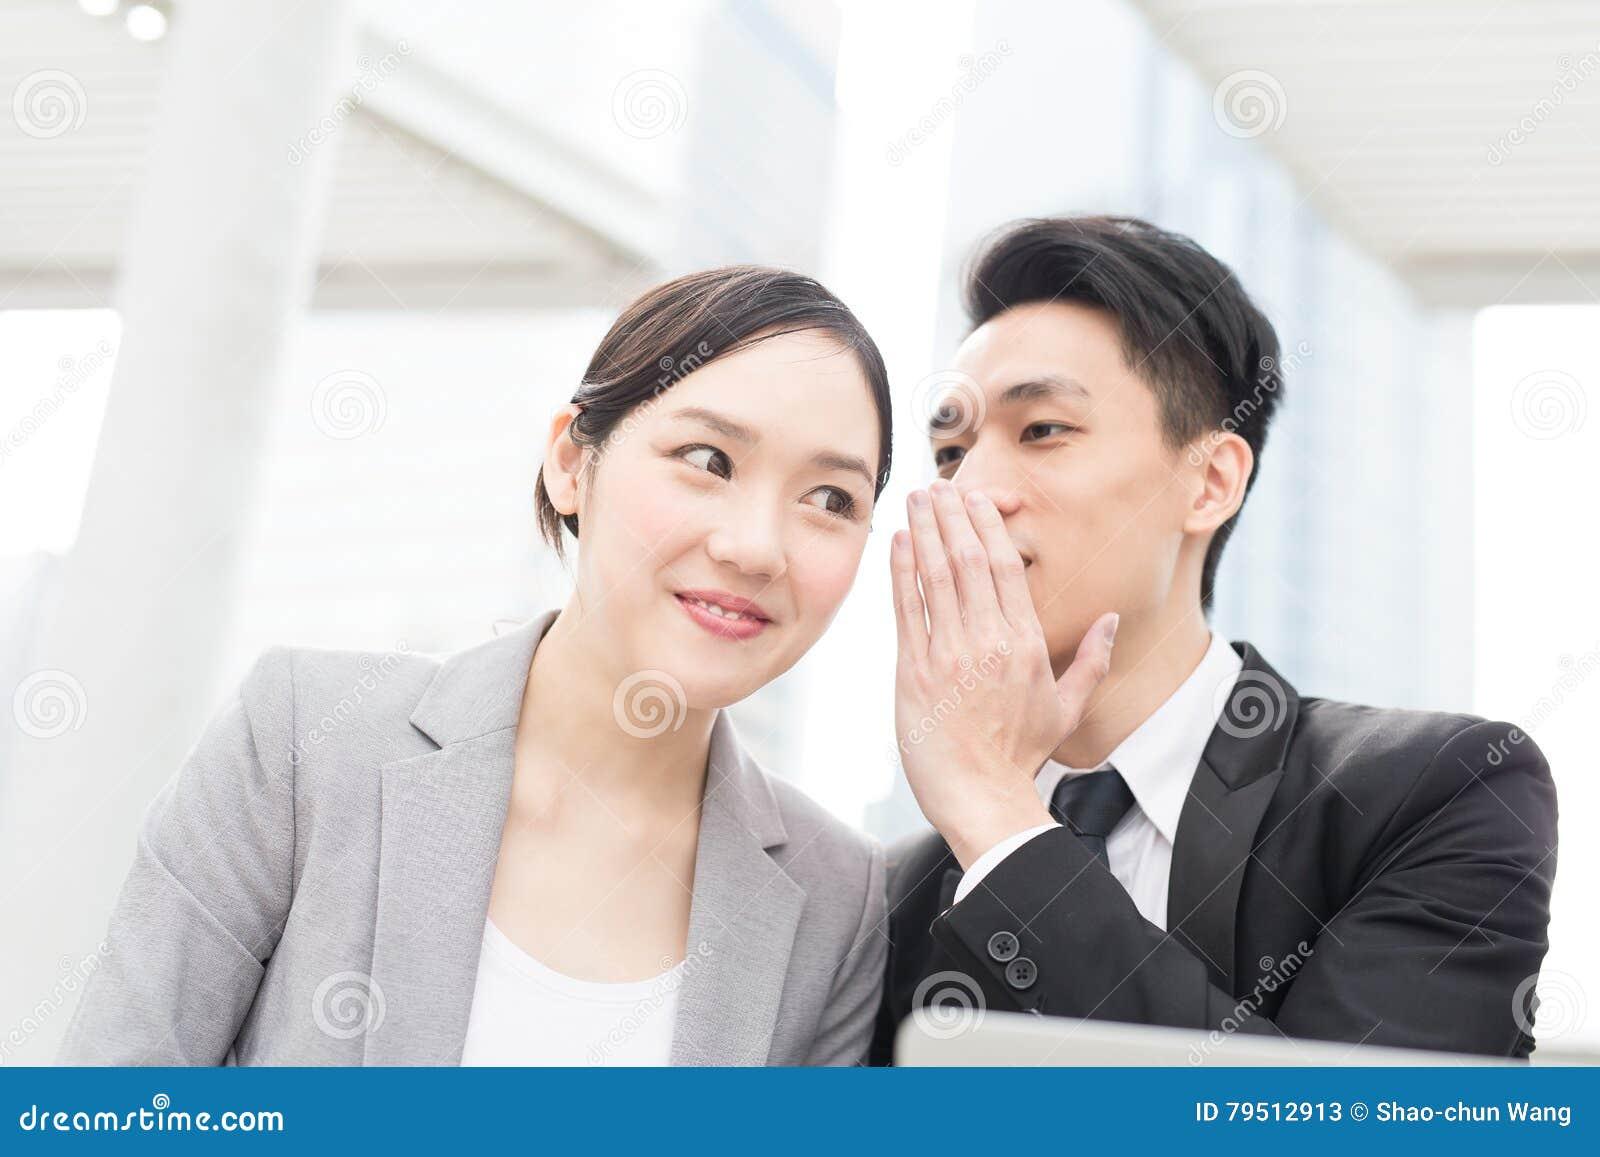 Businesspeople talk in office